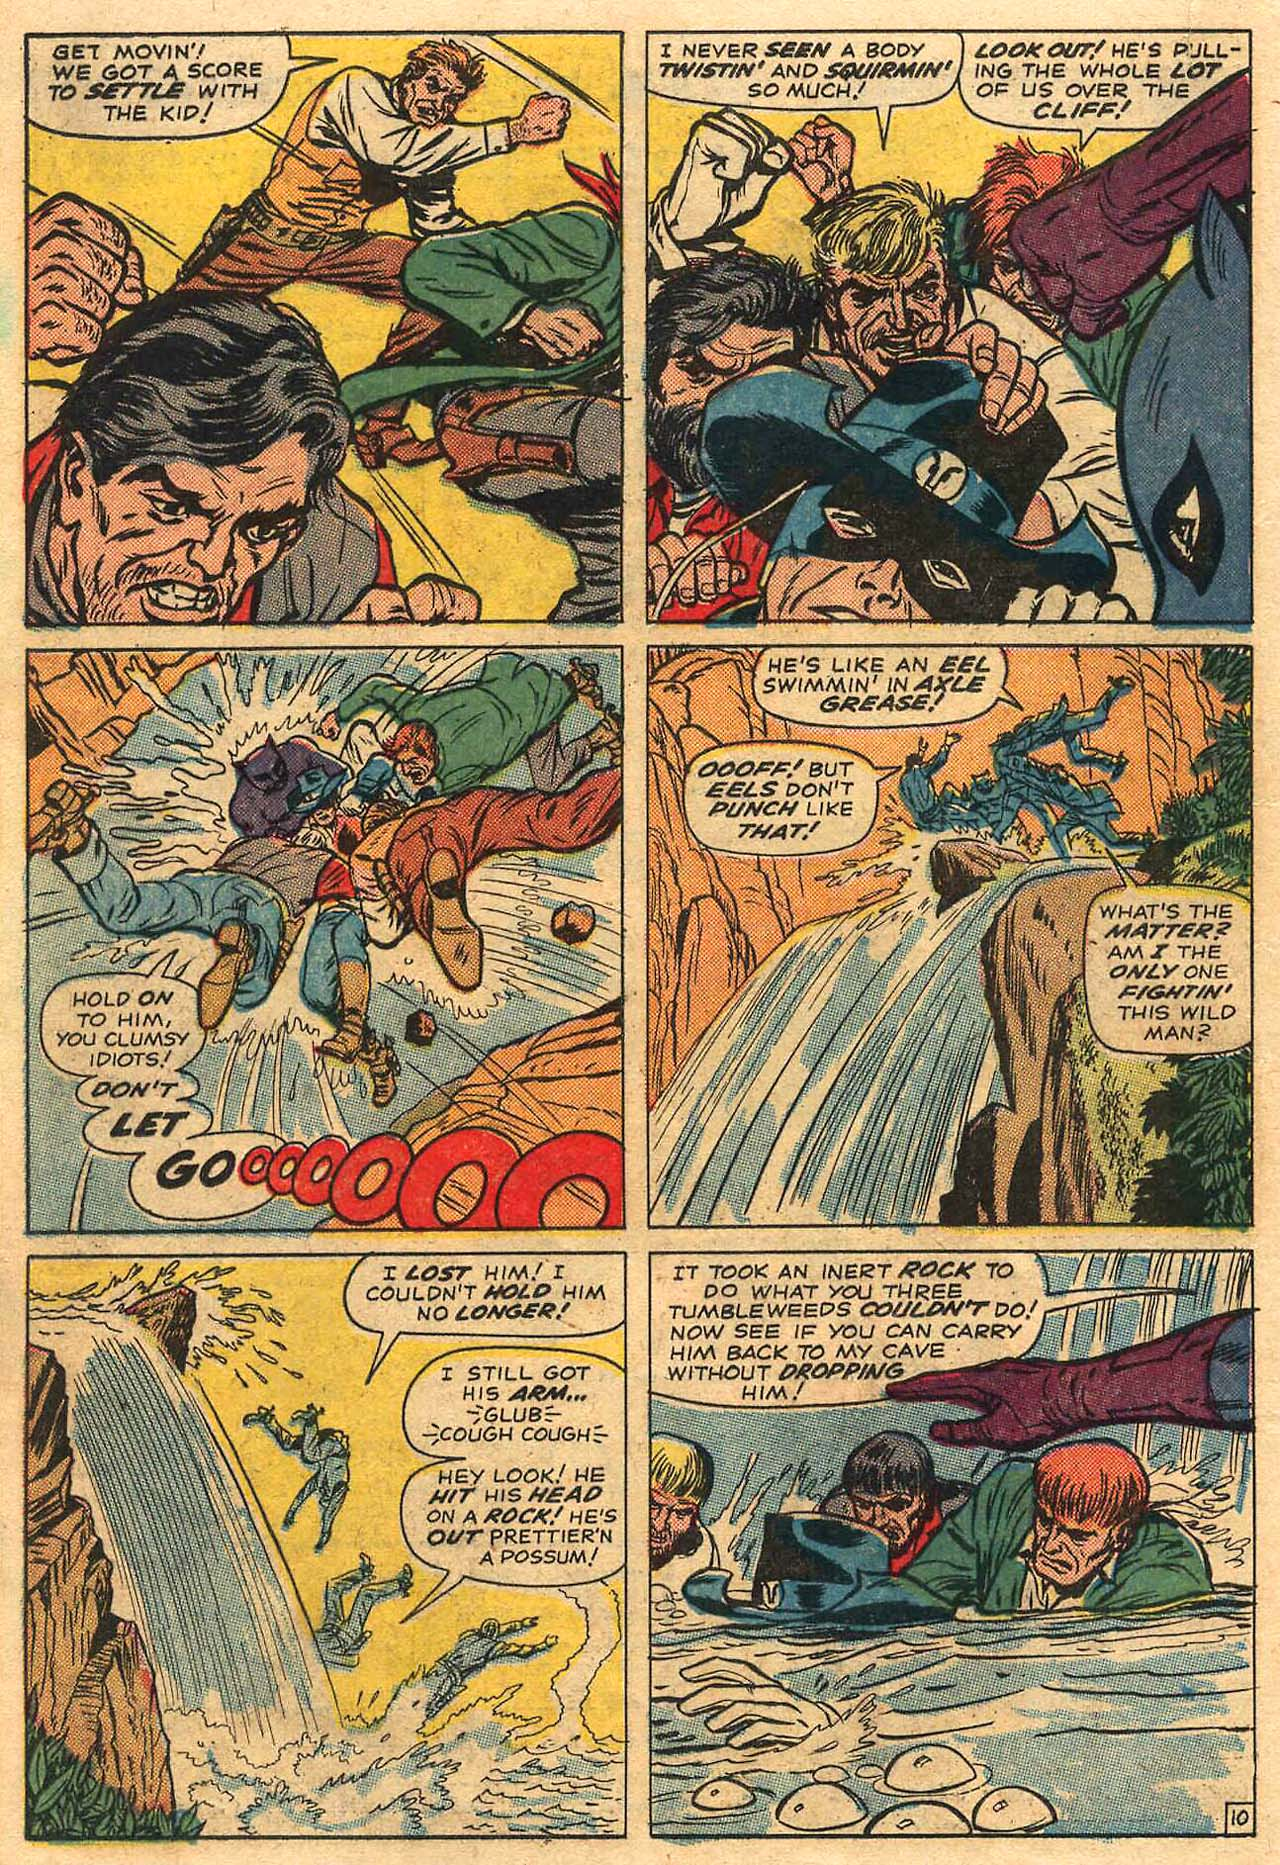 Read online Two-Gun Kid comic -  Issue #77 - 14